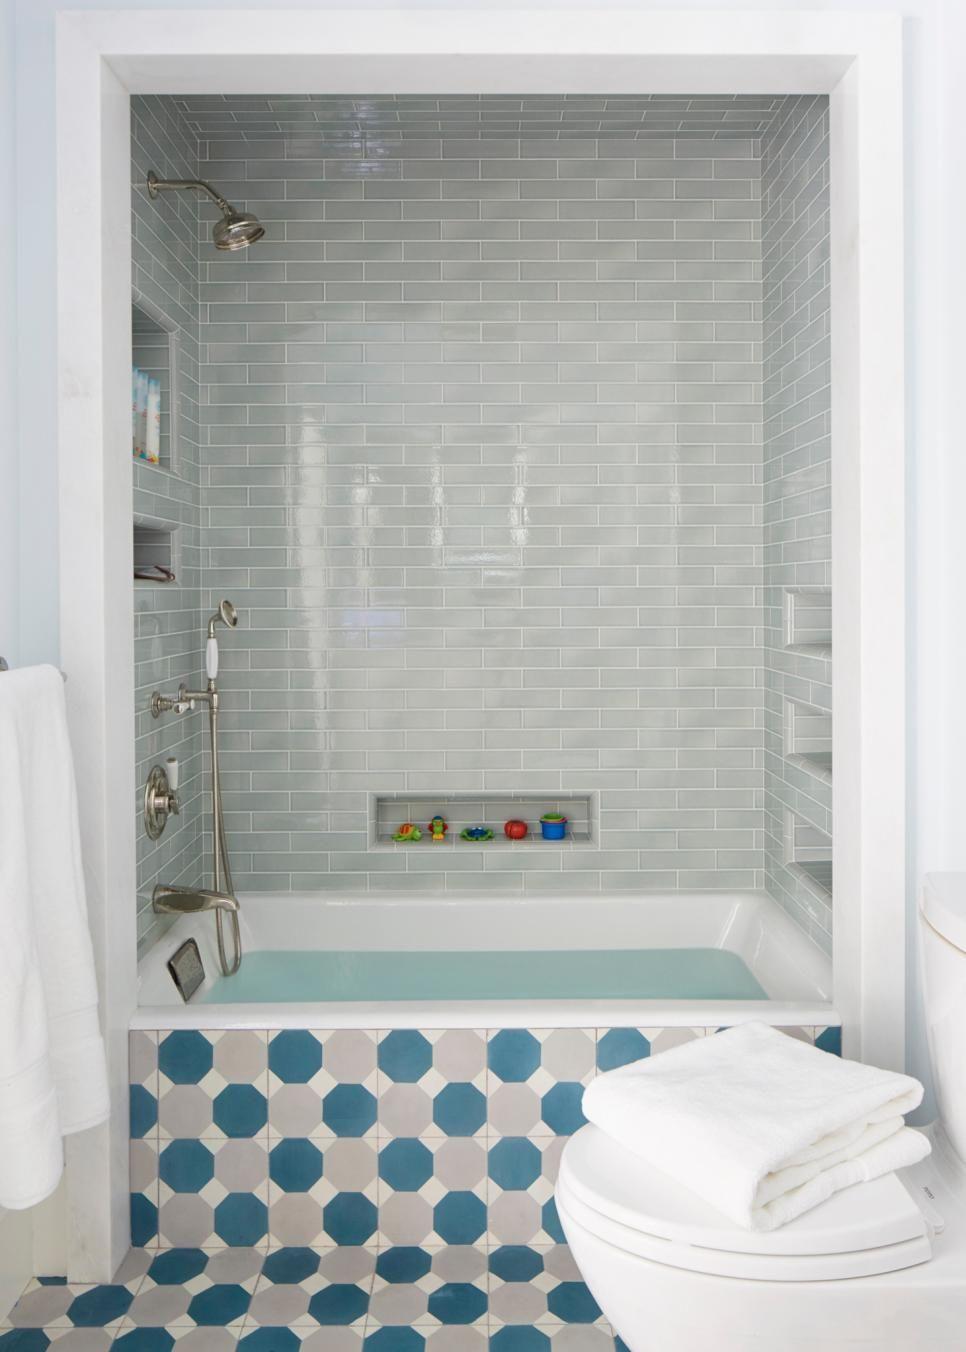 187 Gorgeous Kids Bathroom Design In 2020 Brown Bathroom Decor Bathroom Design Bathroom Redecorating